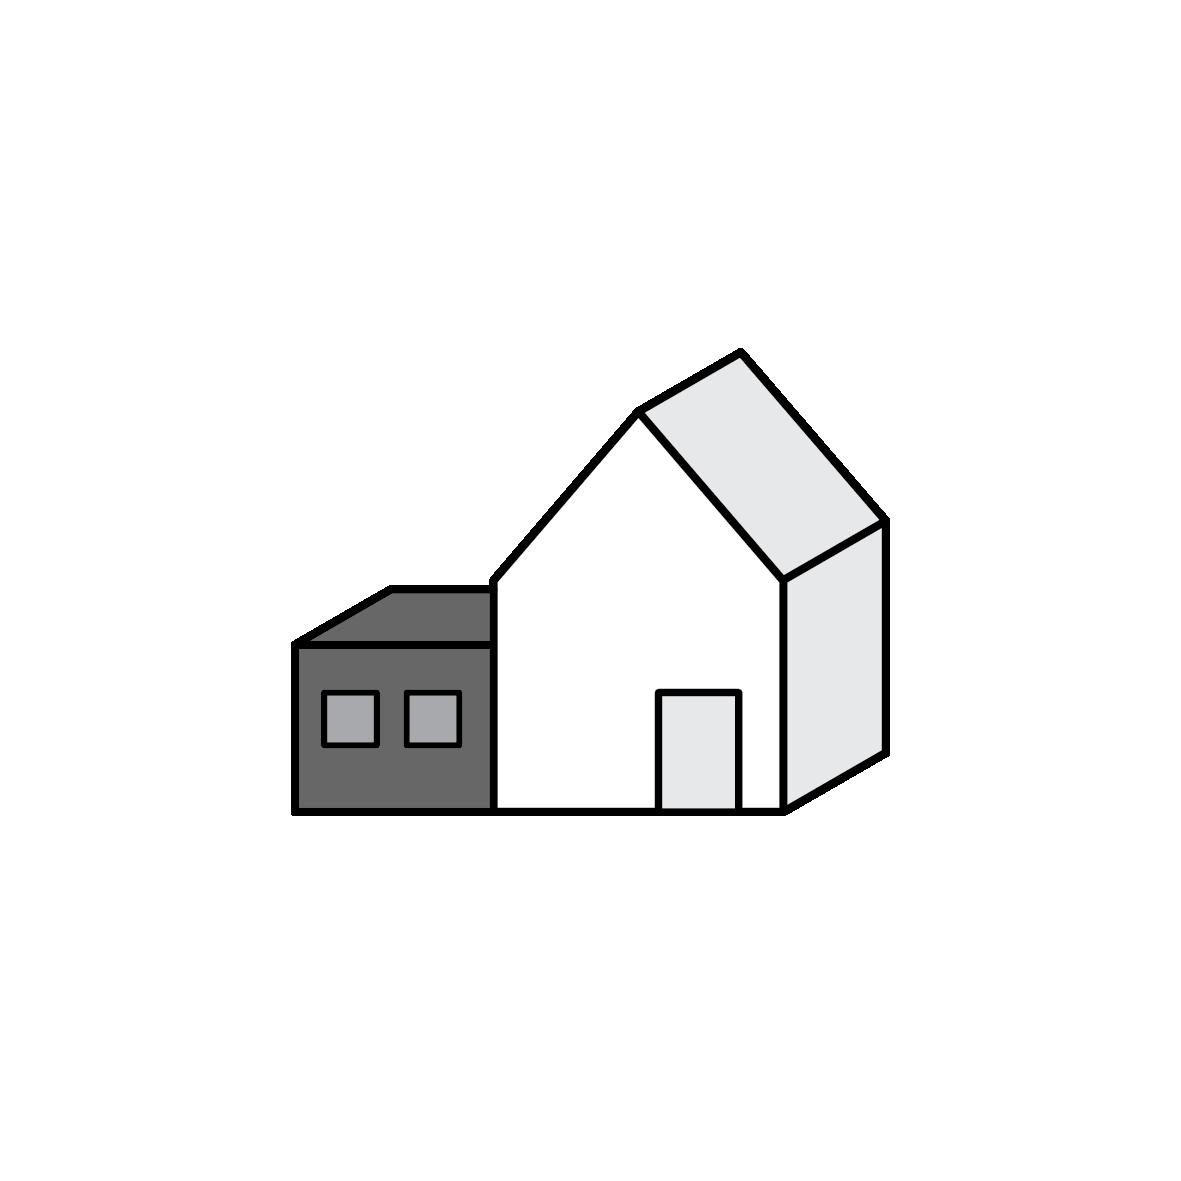 Woonuitbreiding-1796183748